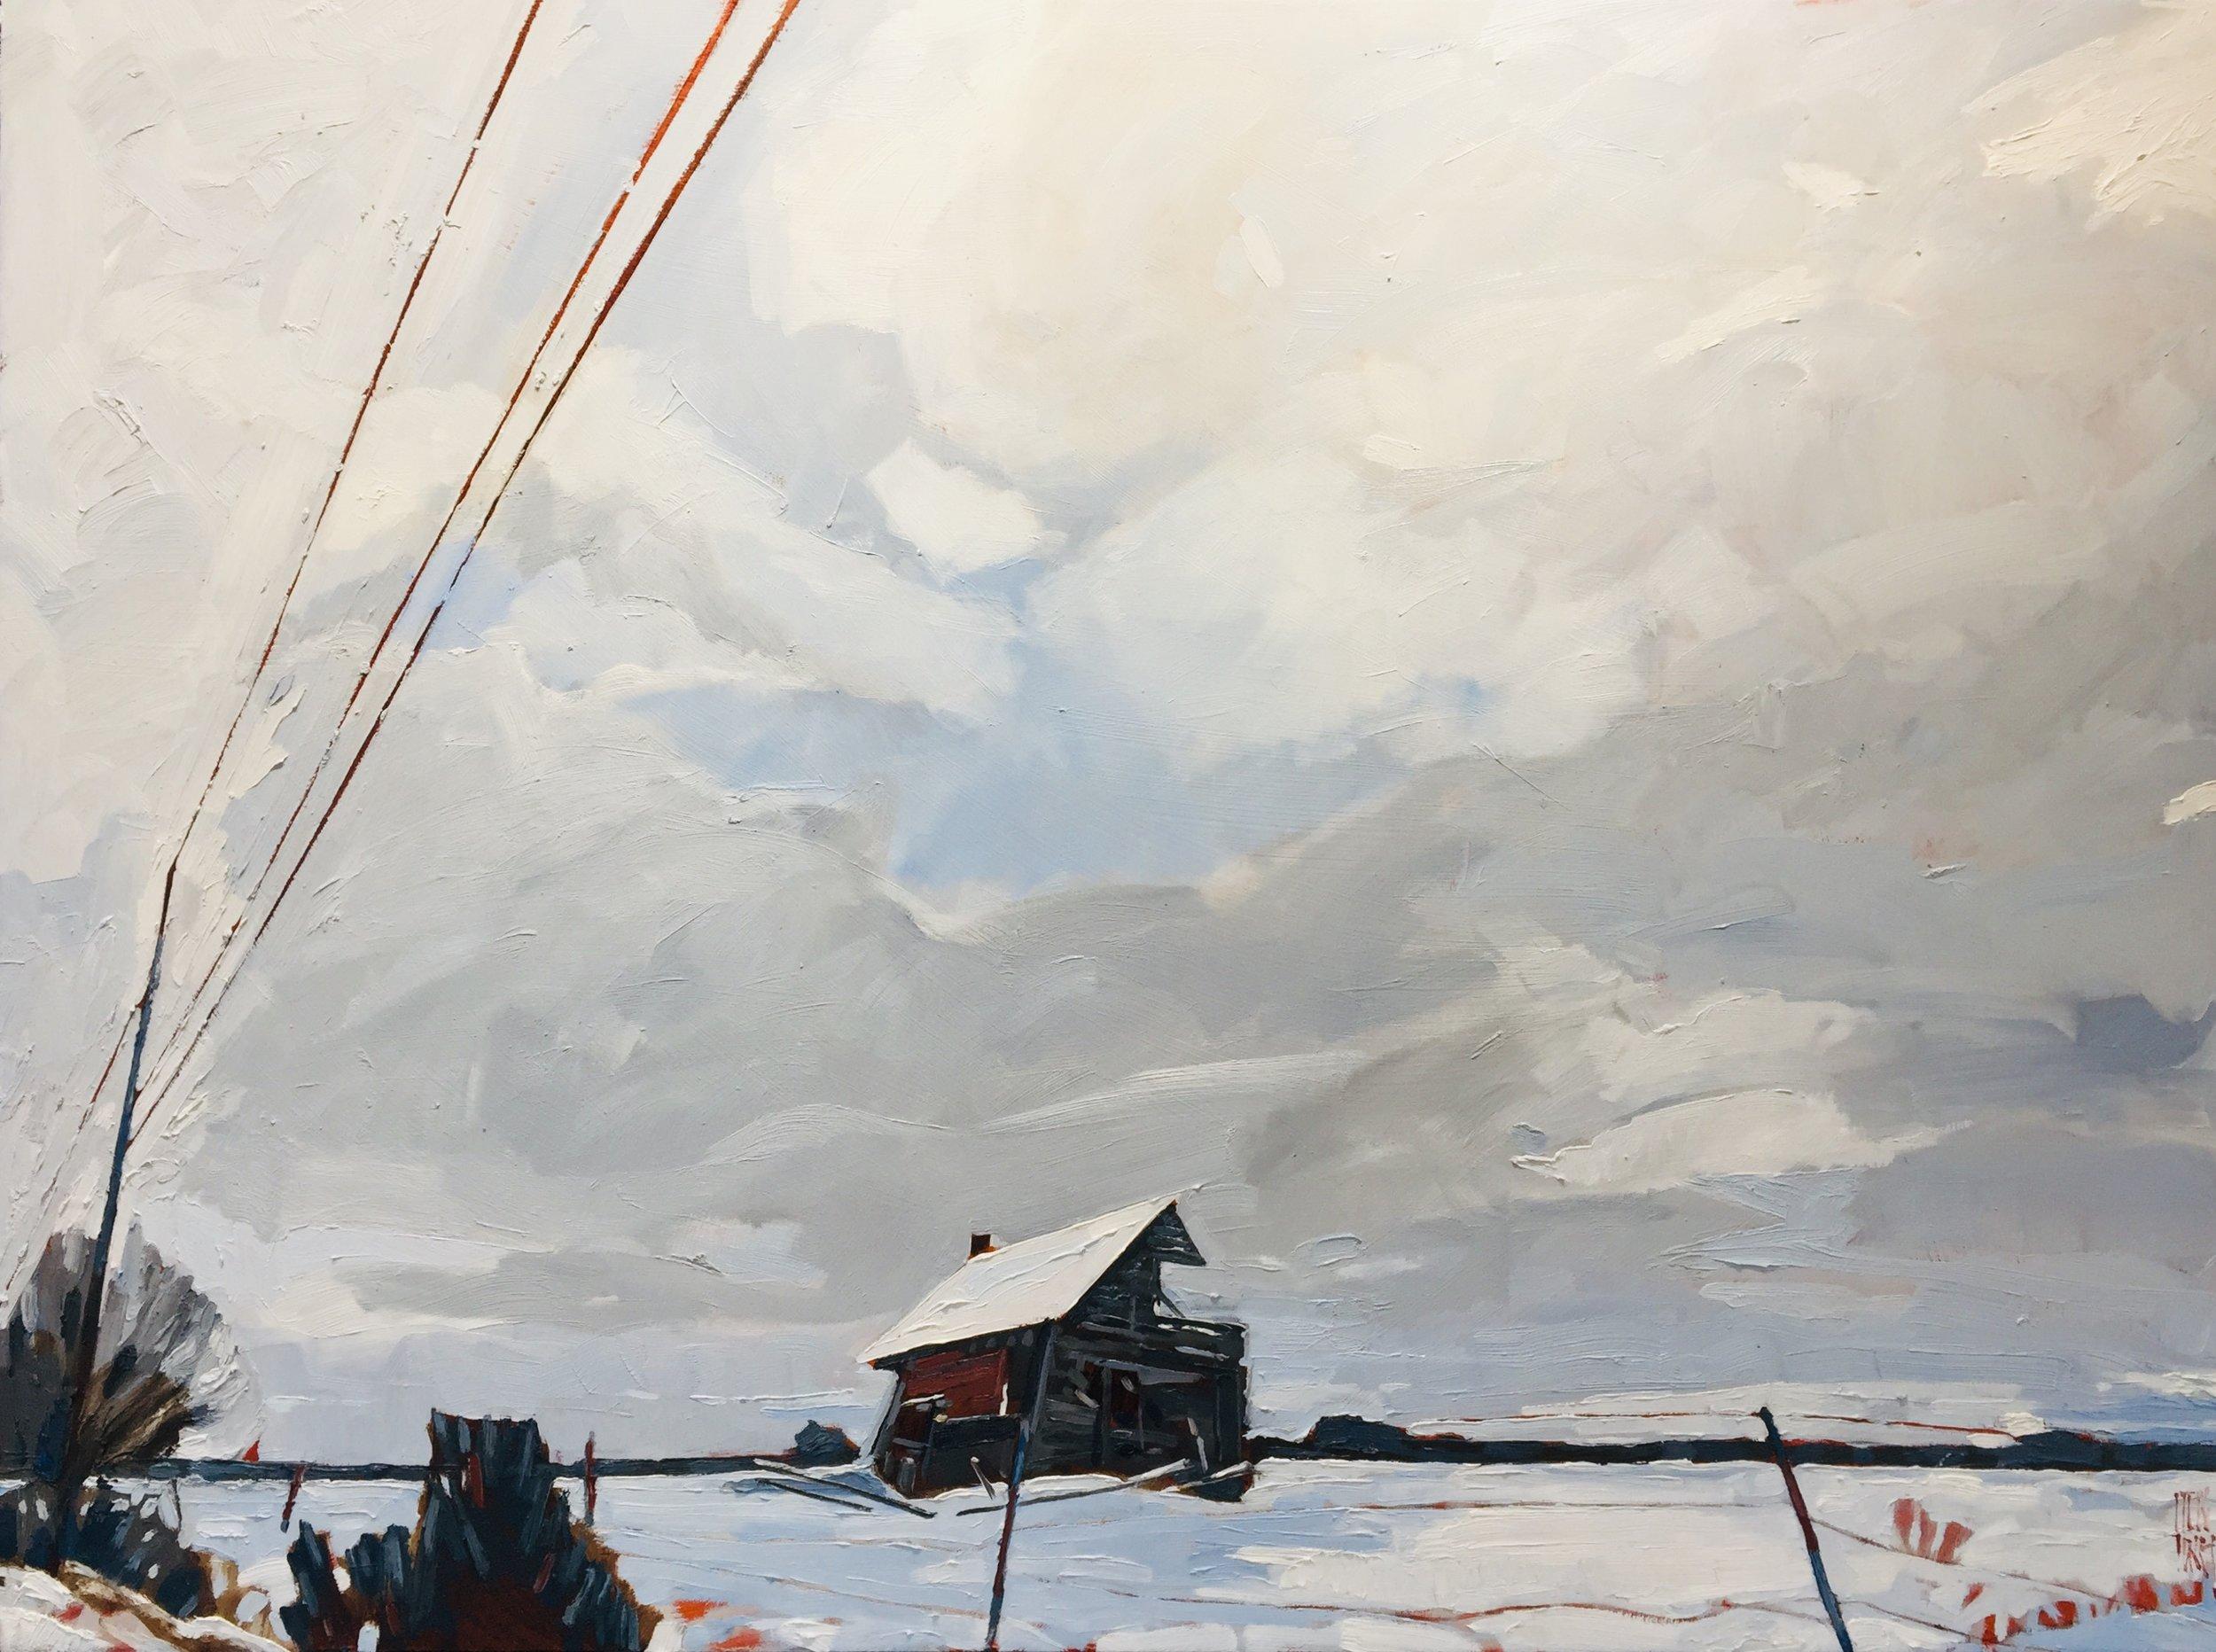 """Drifting Snow"" by Stewart Jones, 2019"